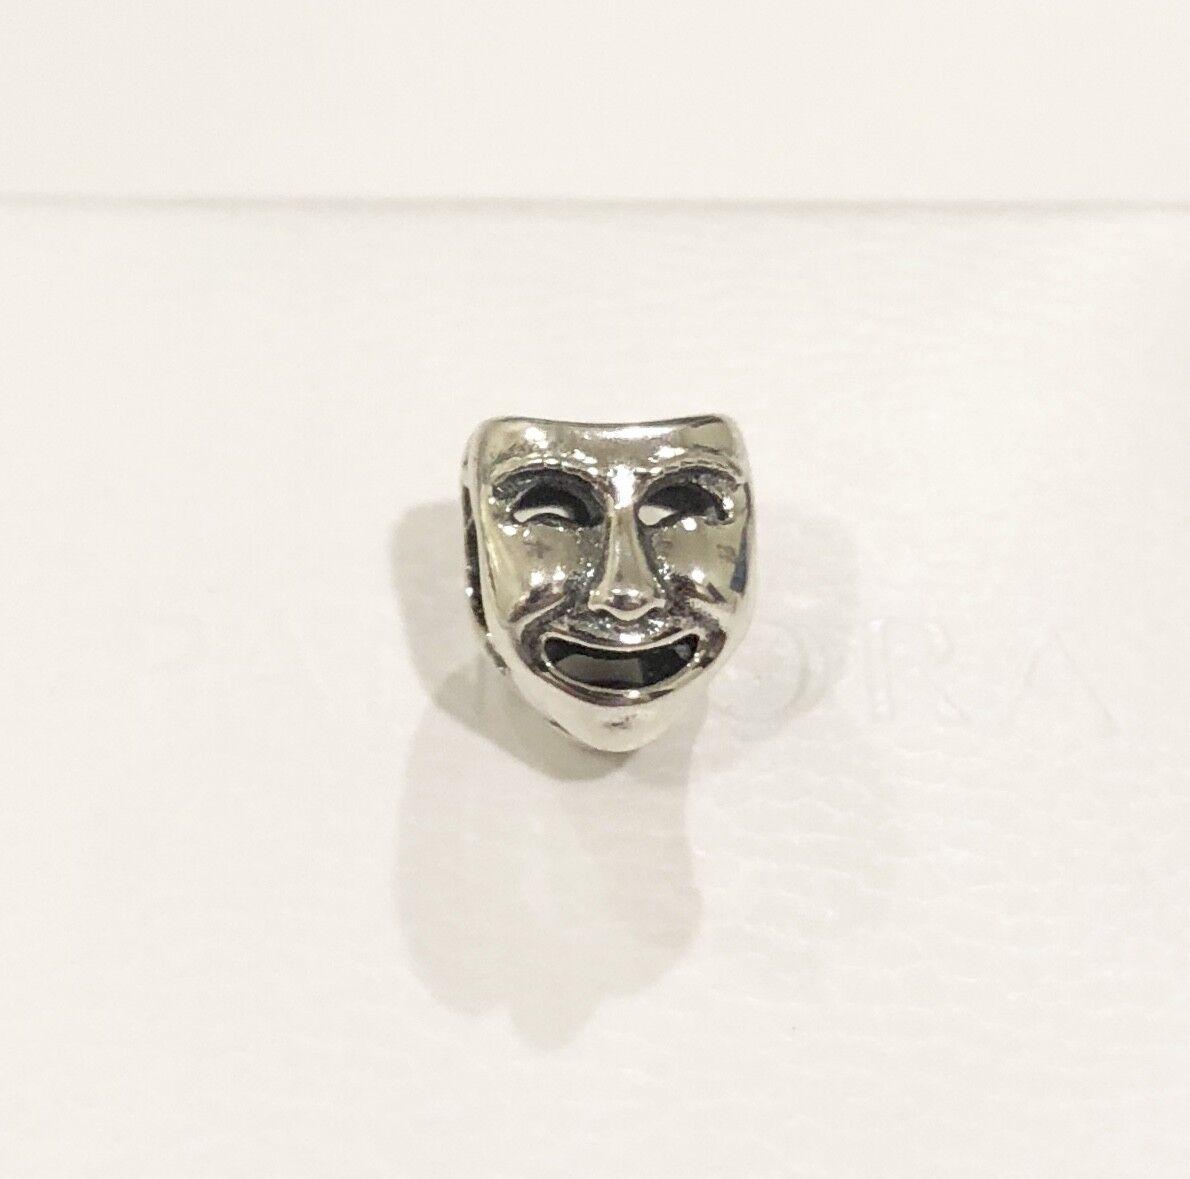 RETIRED ~ Pandora Theatre Mask, Opera, Bead Charm #791177 +G